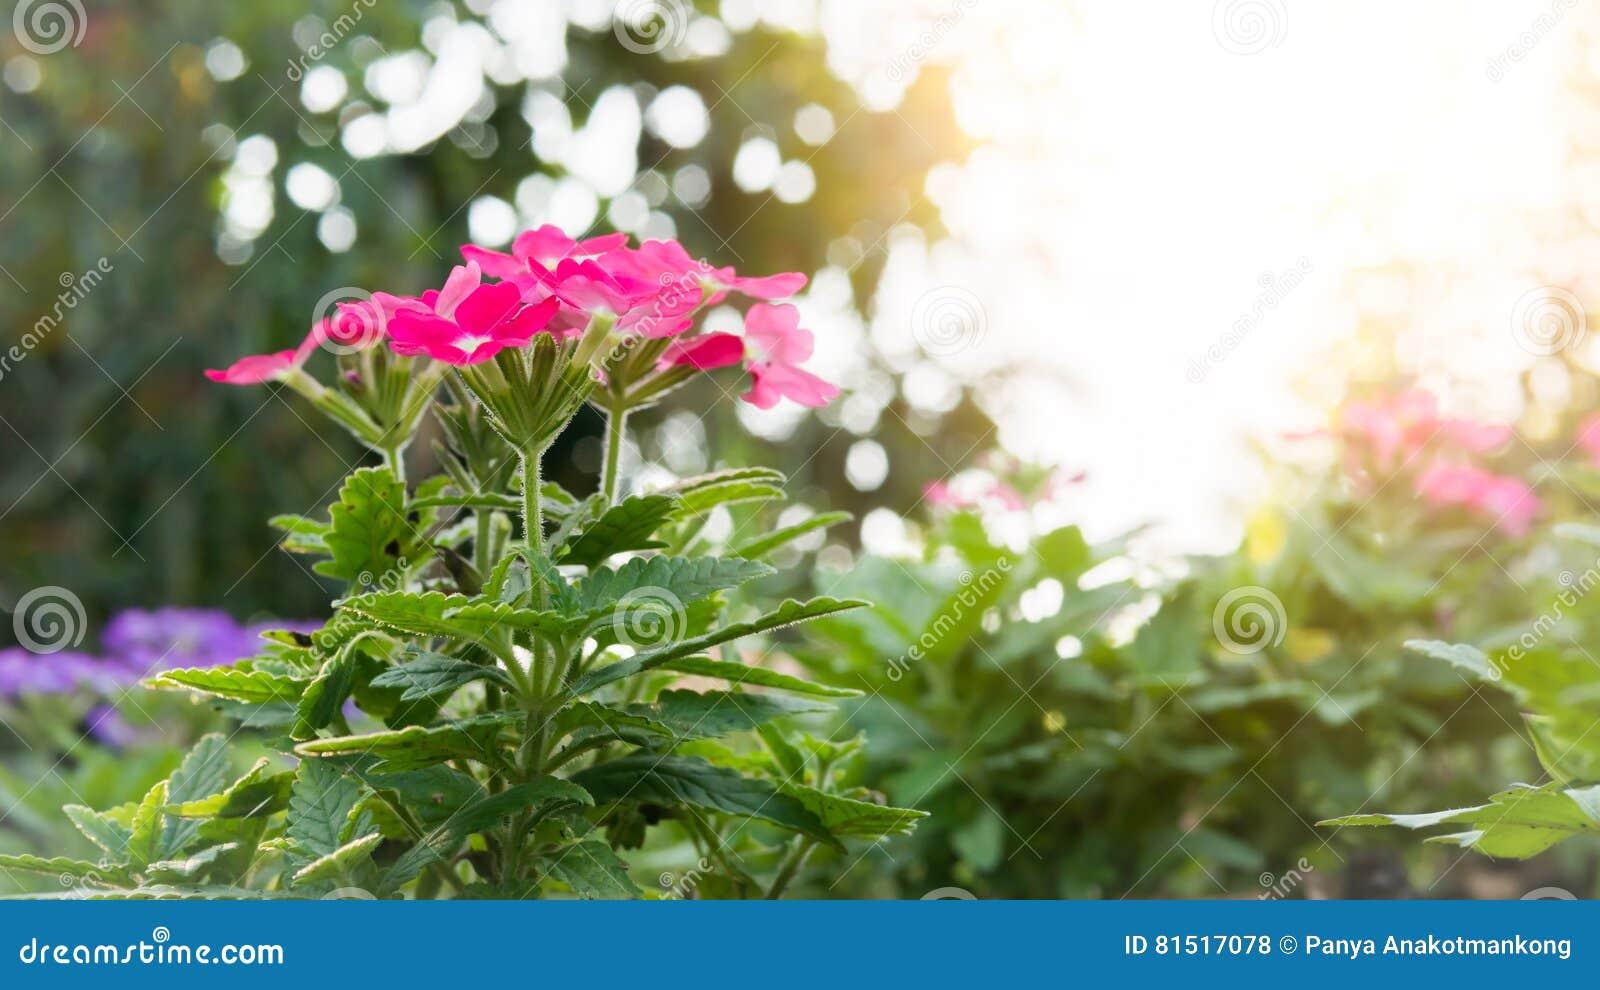 fleur rose de fleur de hybrida de verveine photo stock - image